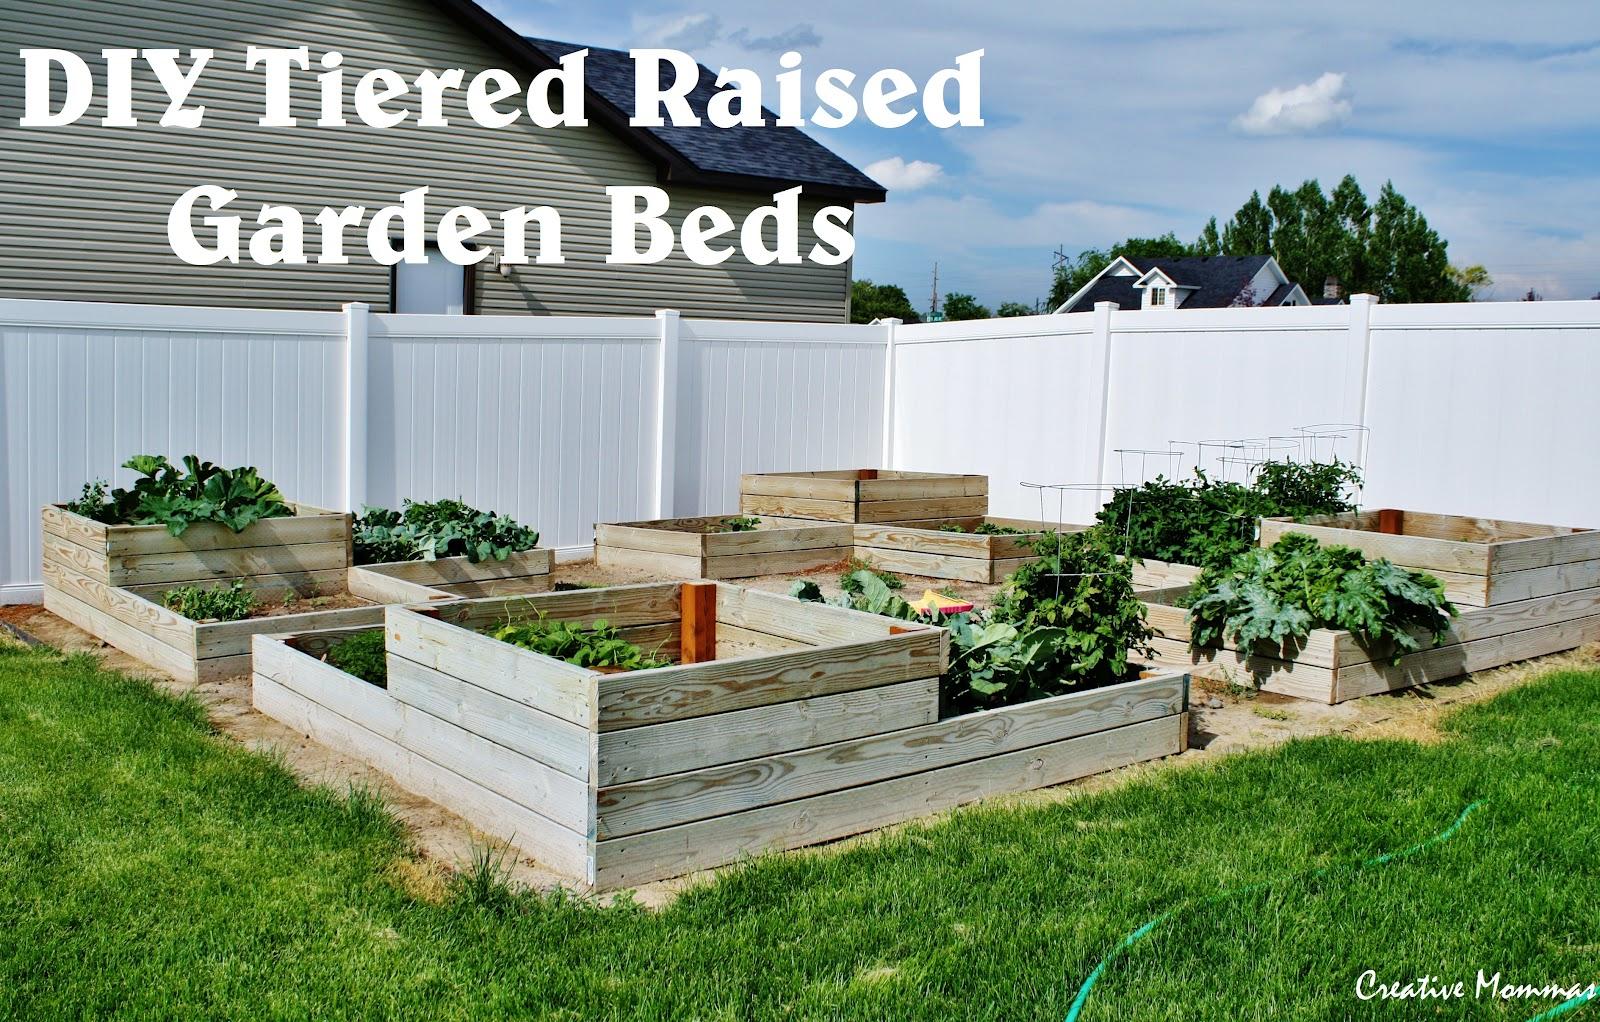 Creative Mommas Diy Tiered Raised Garden Beds